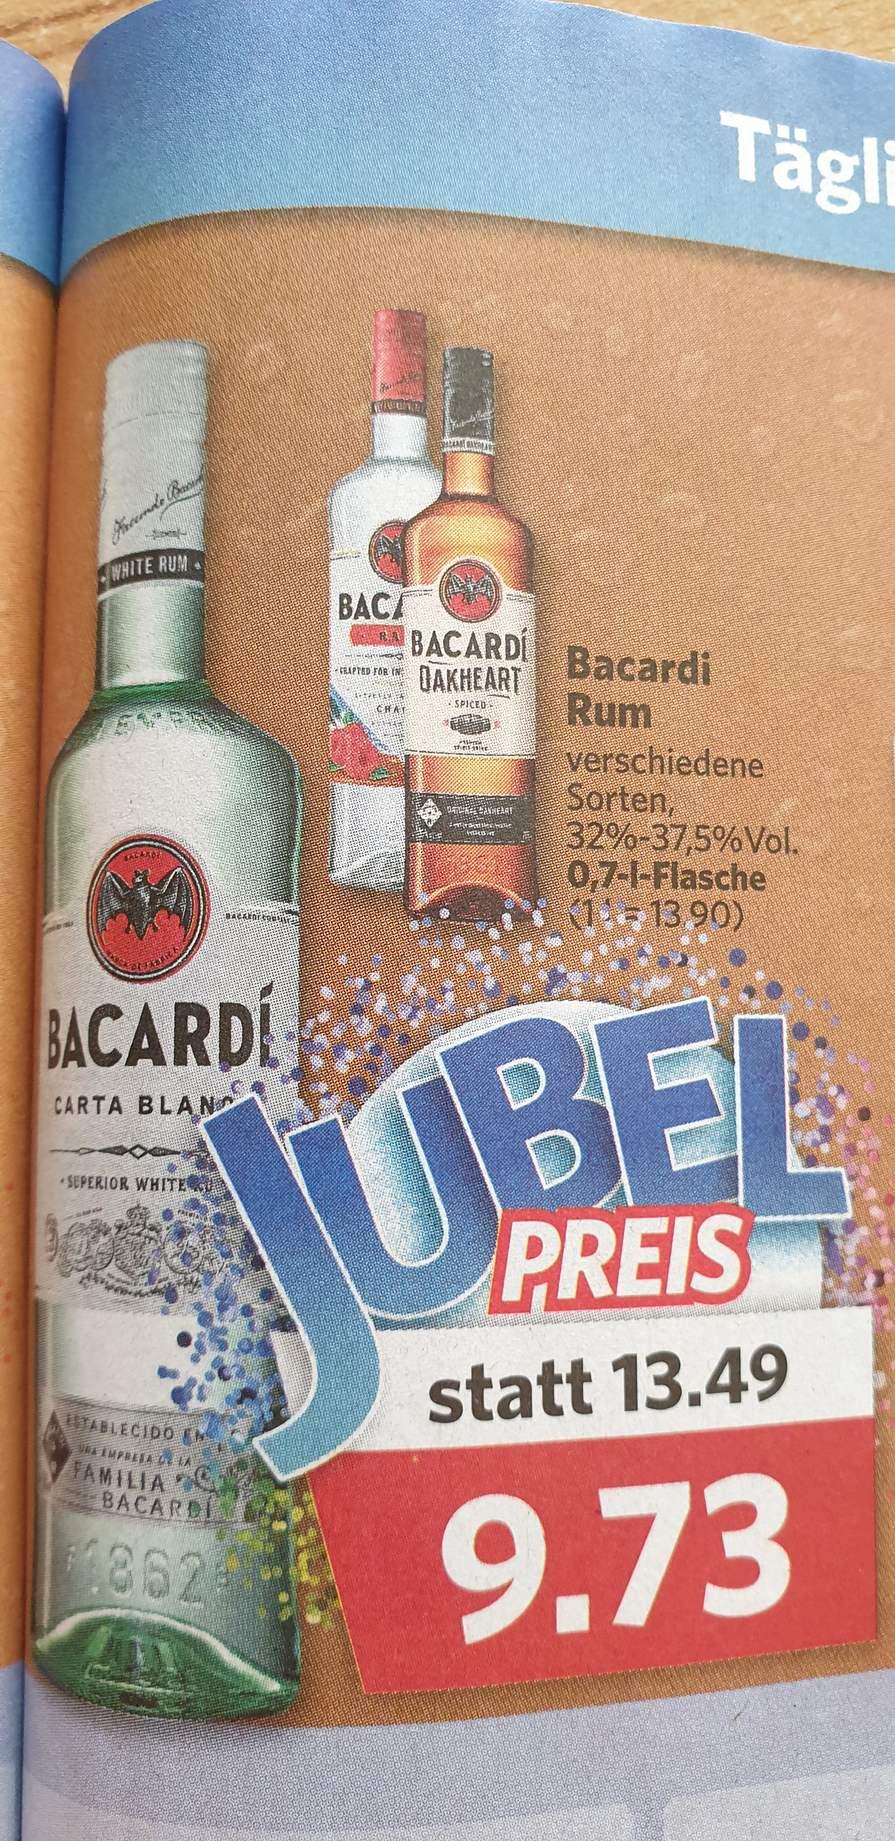 [Combi] Alkohol - Smirnoff Vodka / Bacardi / Tequila